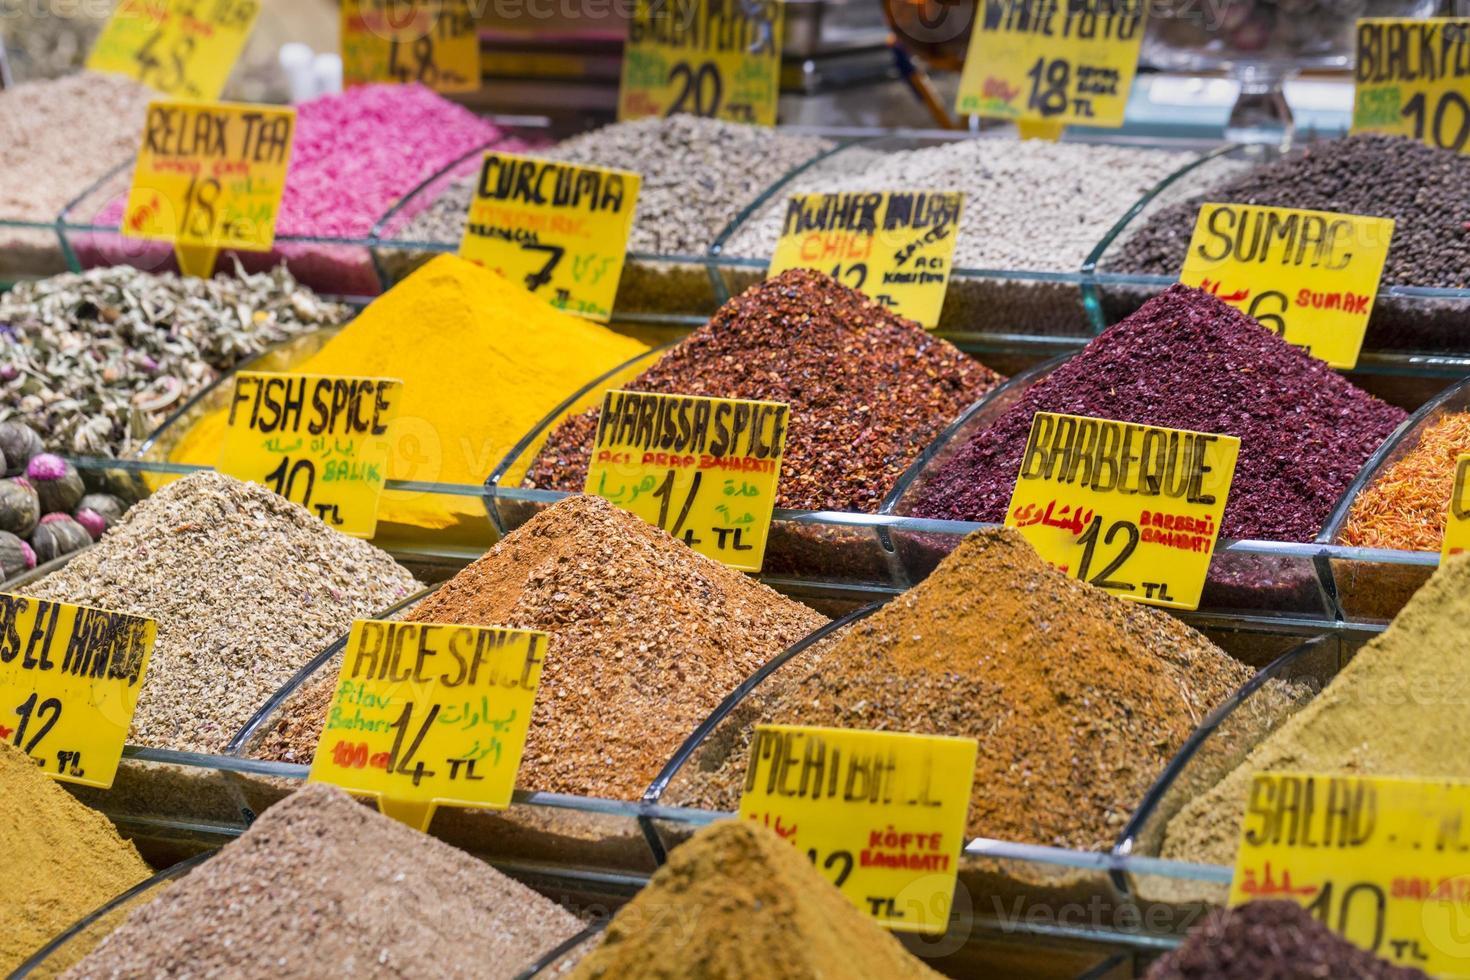 especiarias coloridas no bazar de especiarias em Istambul, Turquia foto